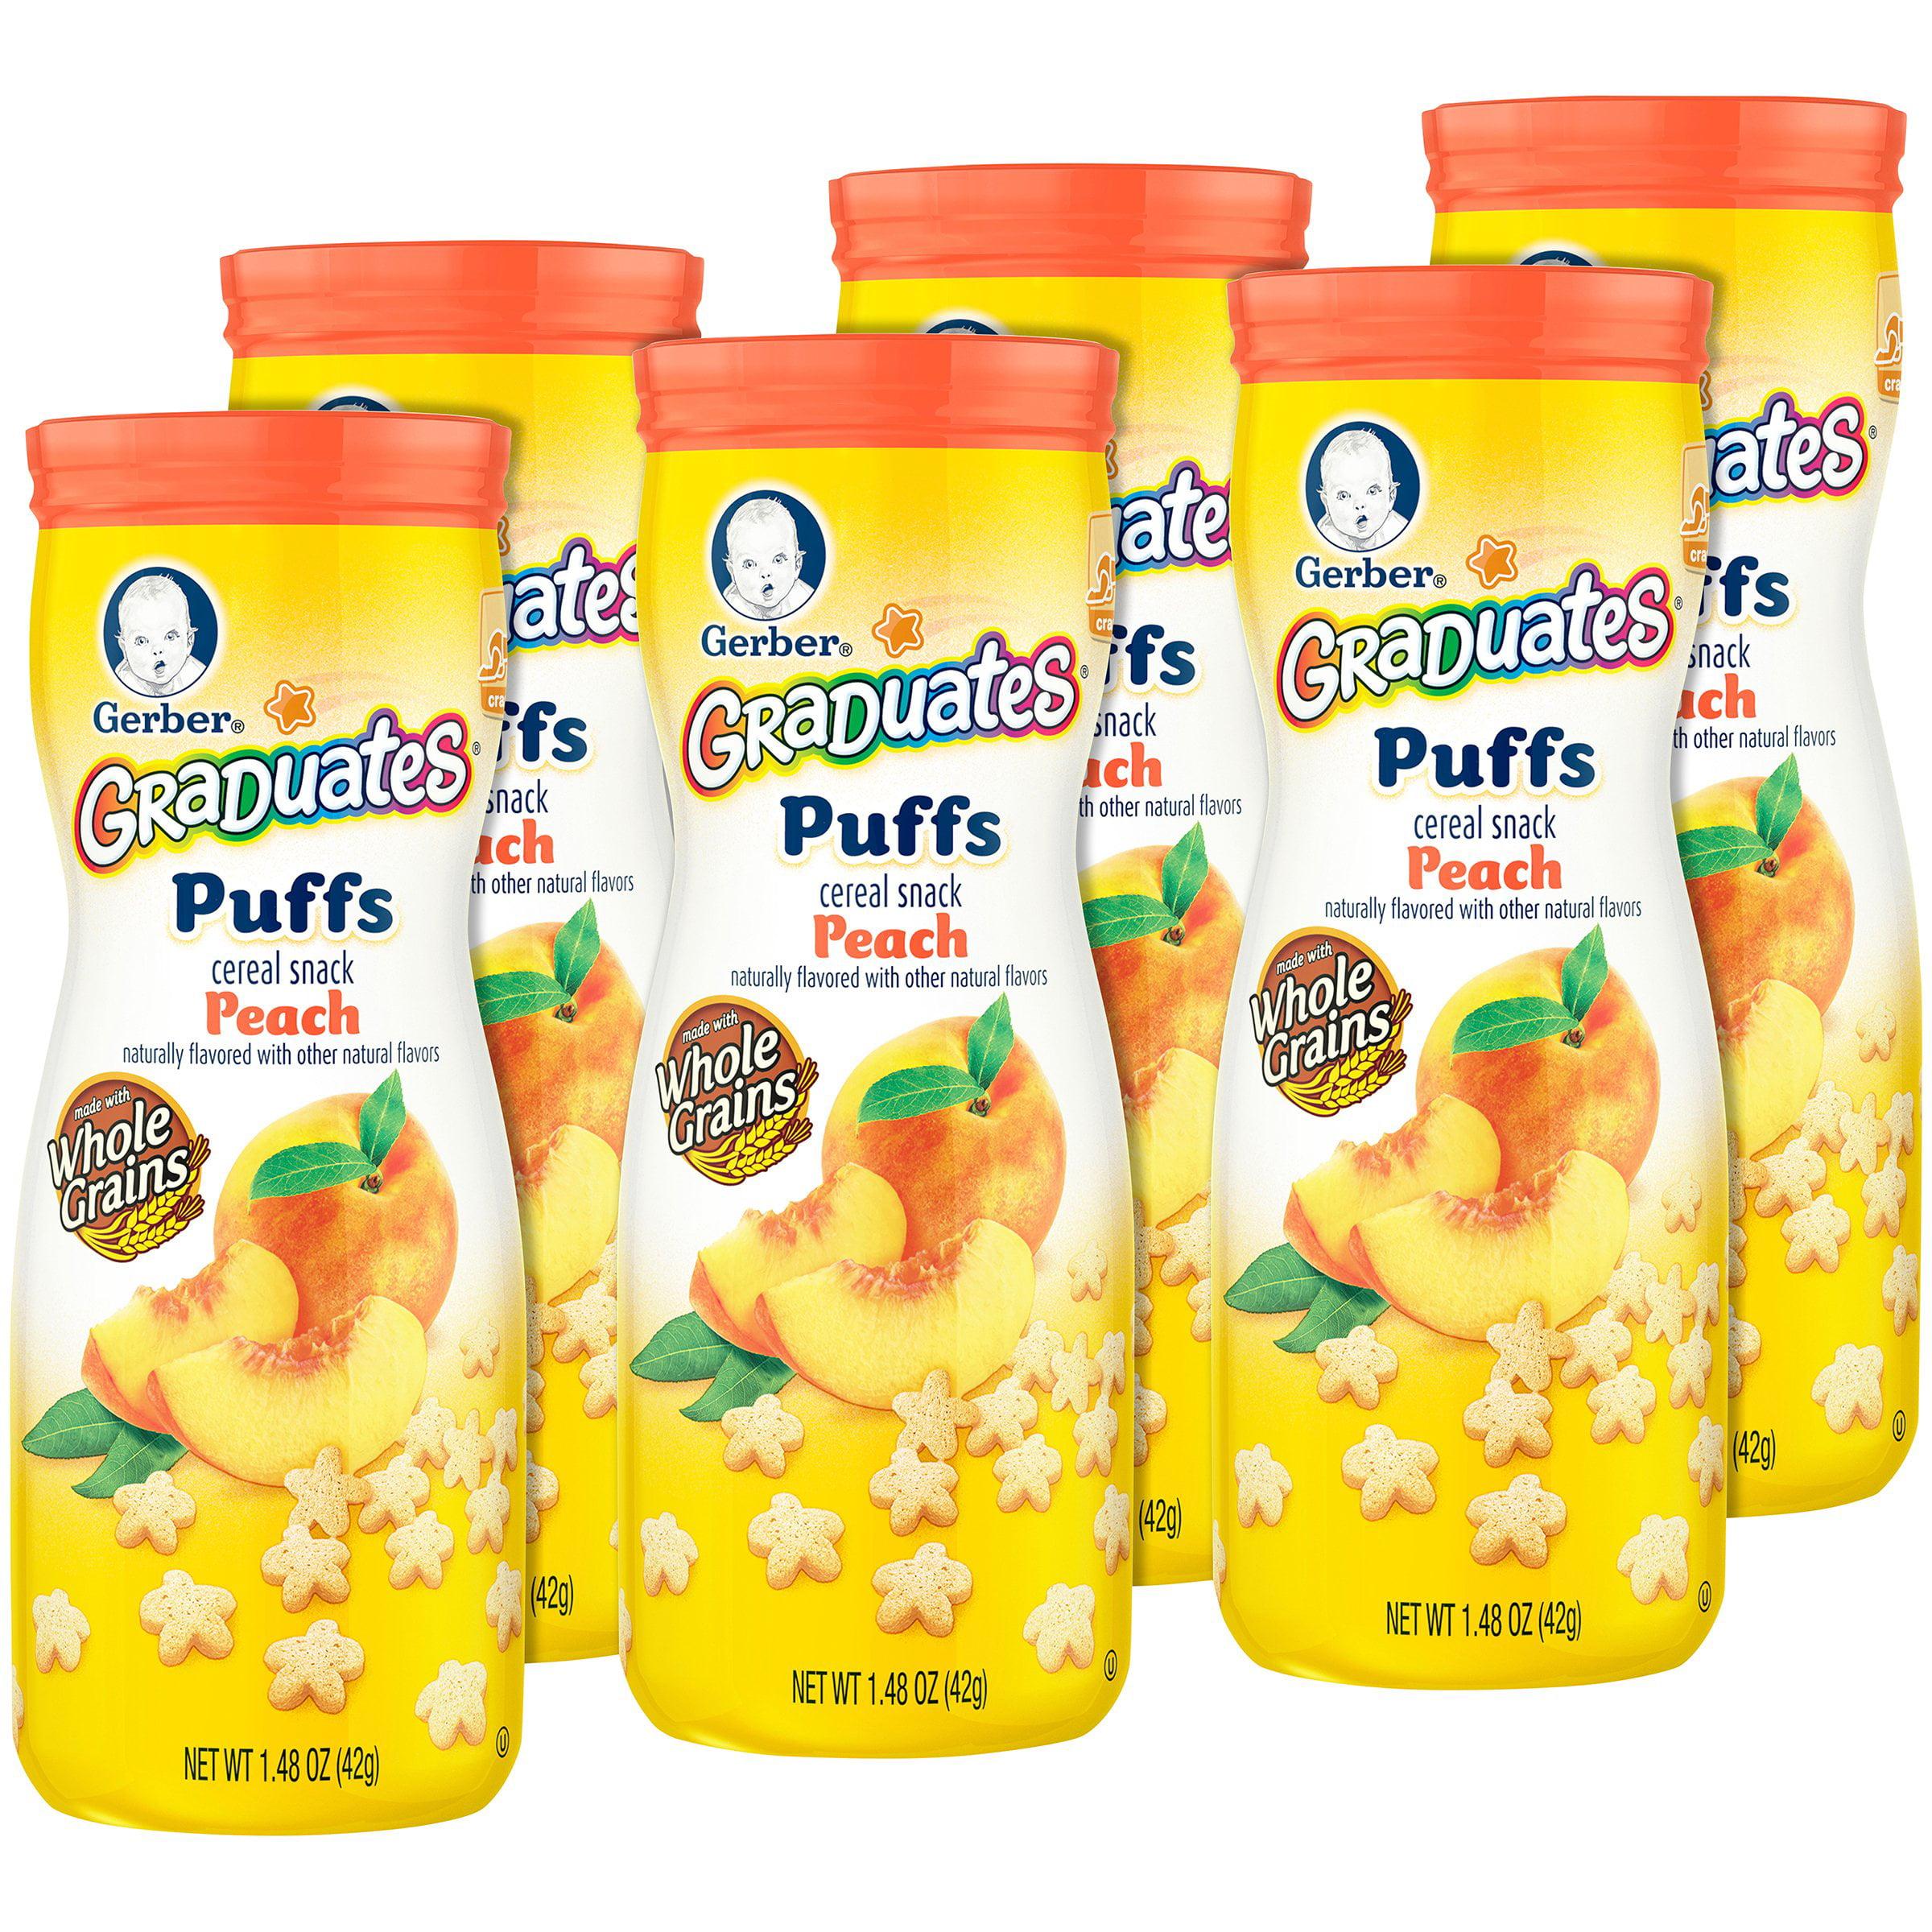 Gerber Graduates Puffs, Peach, 1.48 oz (Pack of 6)